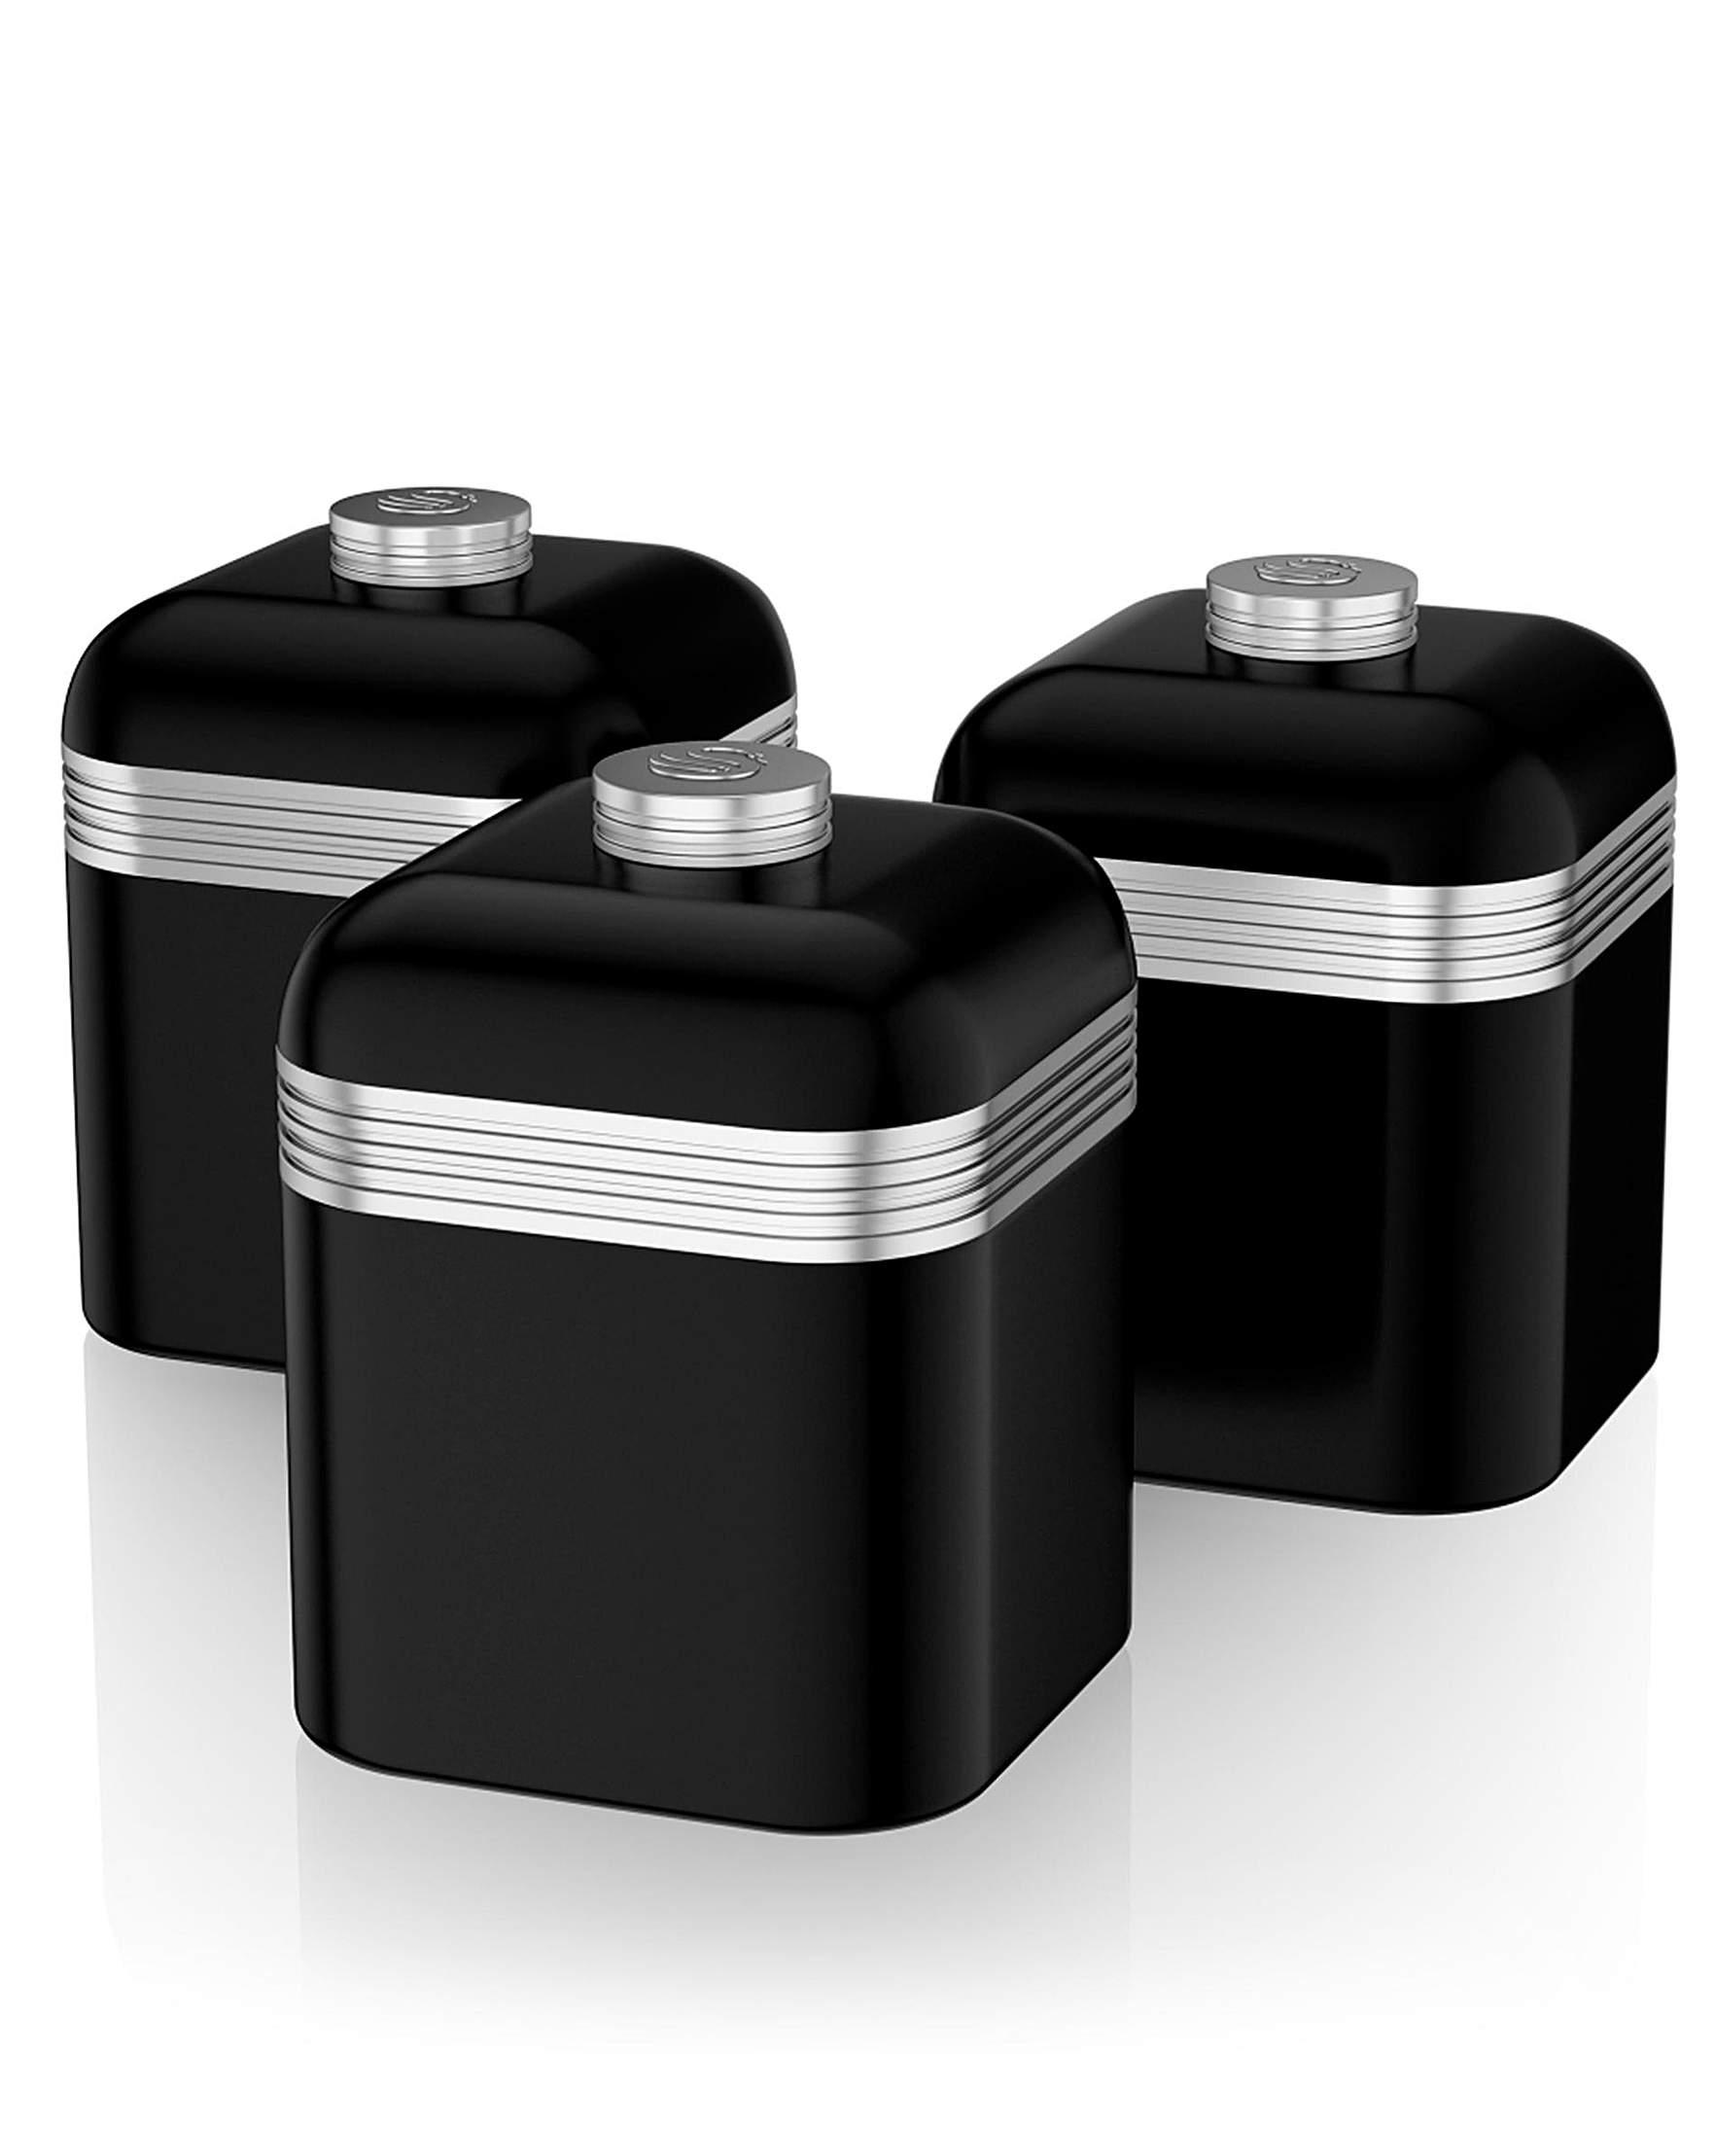 swan retro set of 3 canisters black j d williams designer kitchen